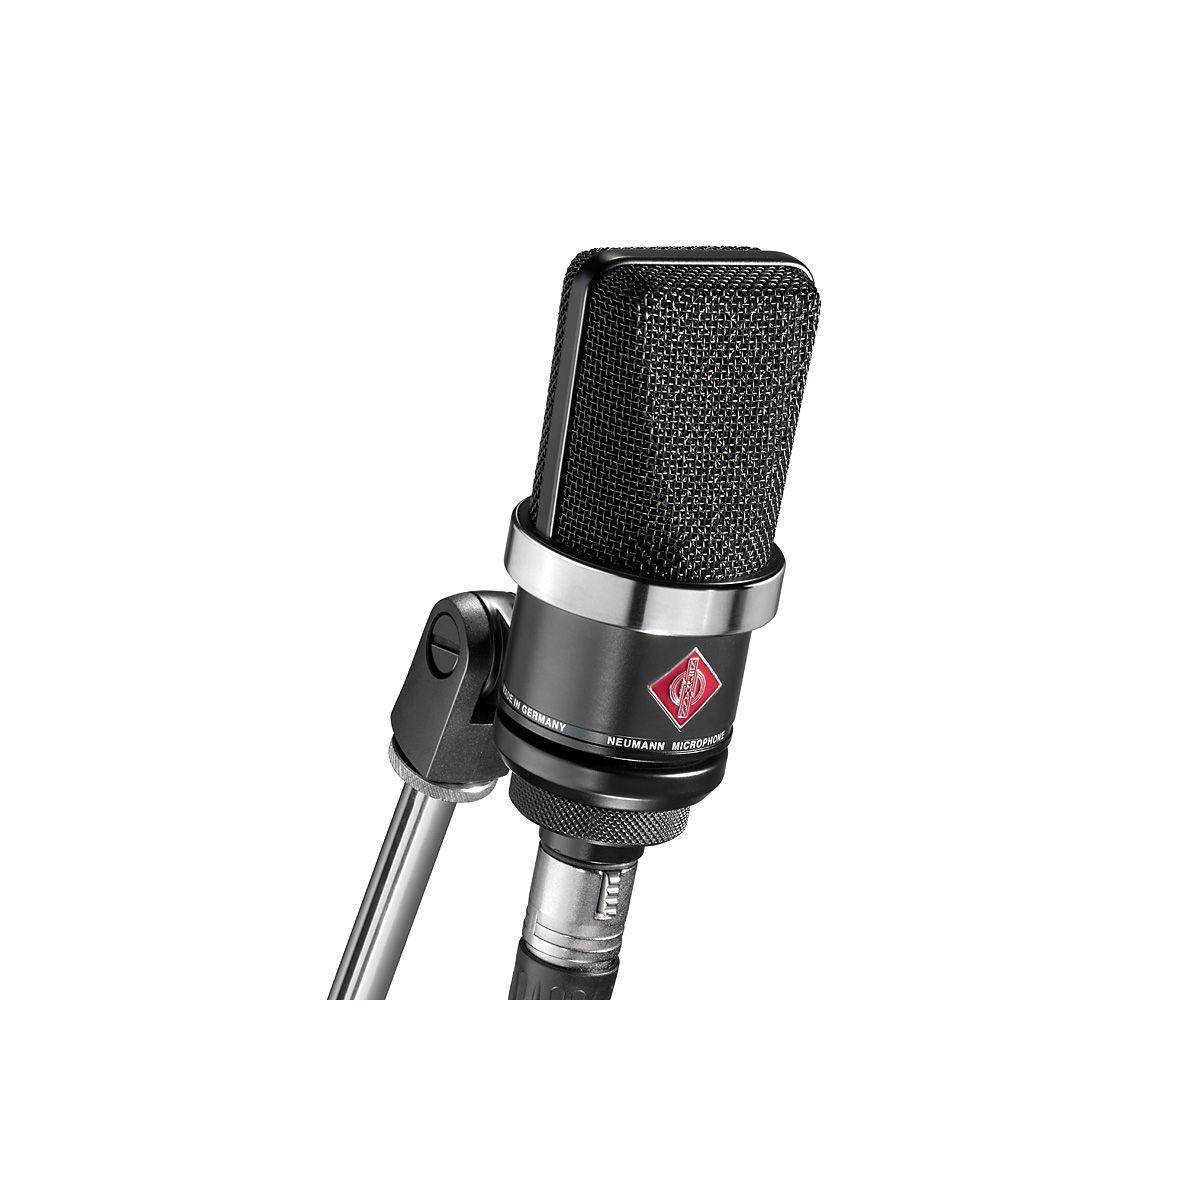 Micros studio - Neumann - TLM 102 BK